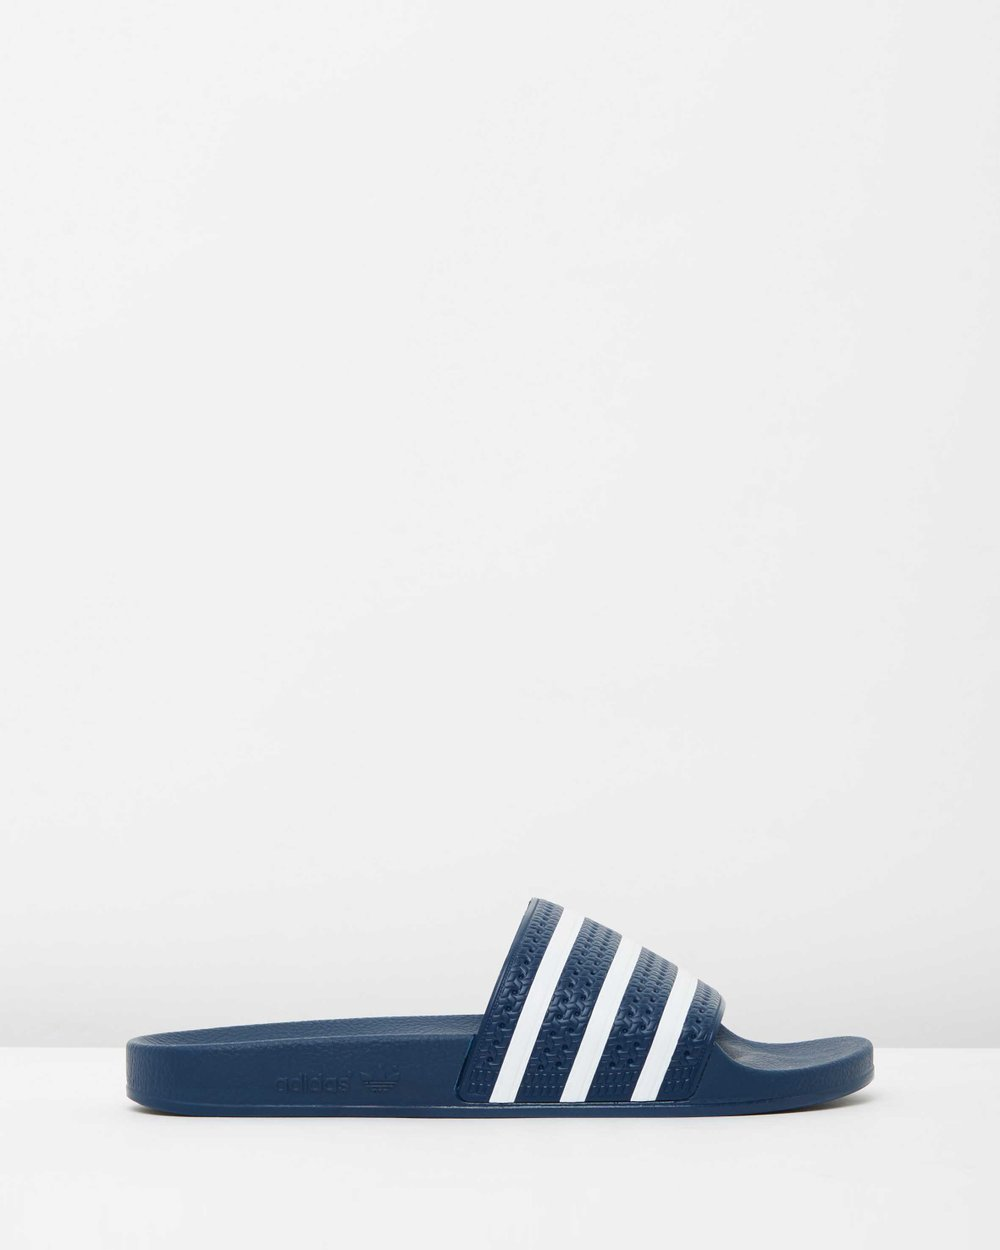 5a38c00a3221 Adilette - Unisex by adidas Originals Online